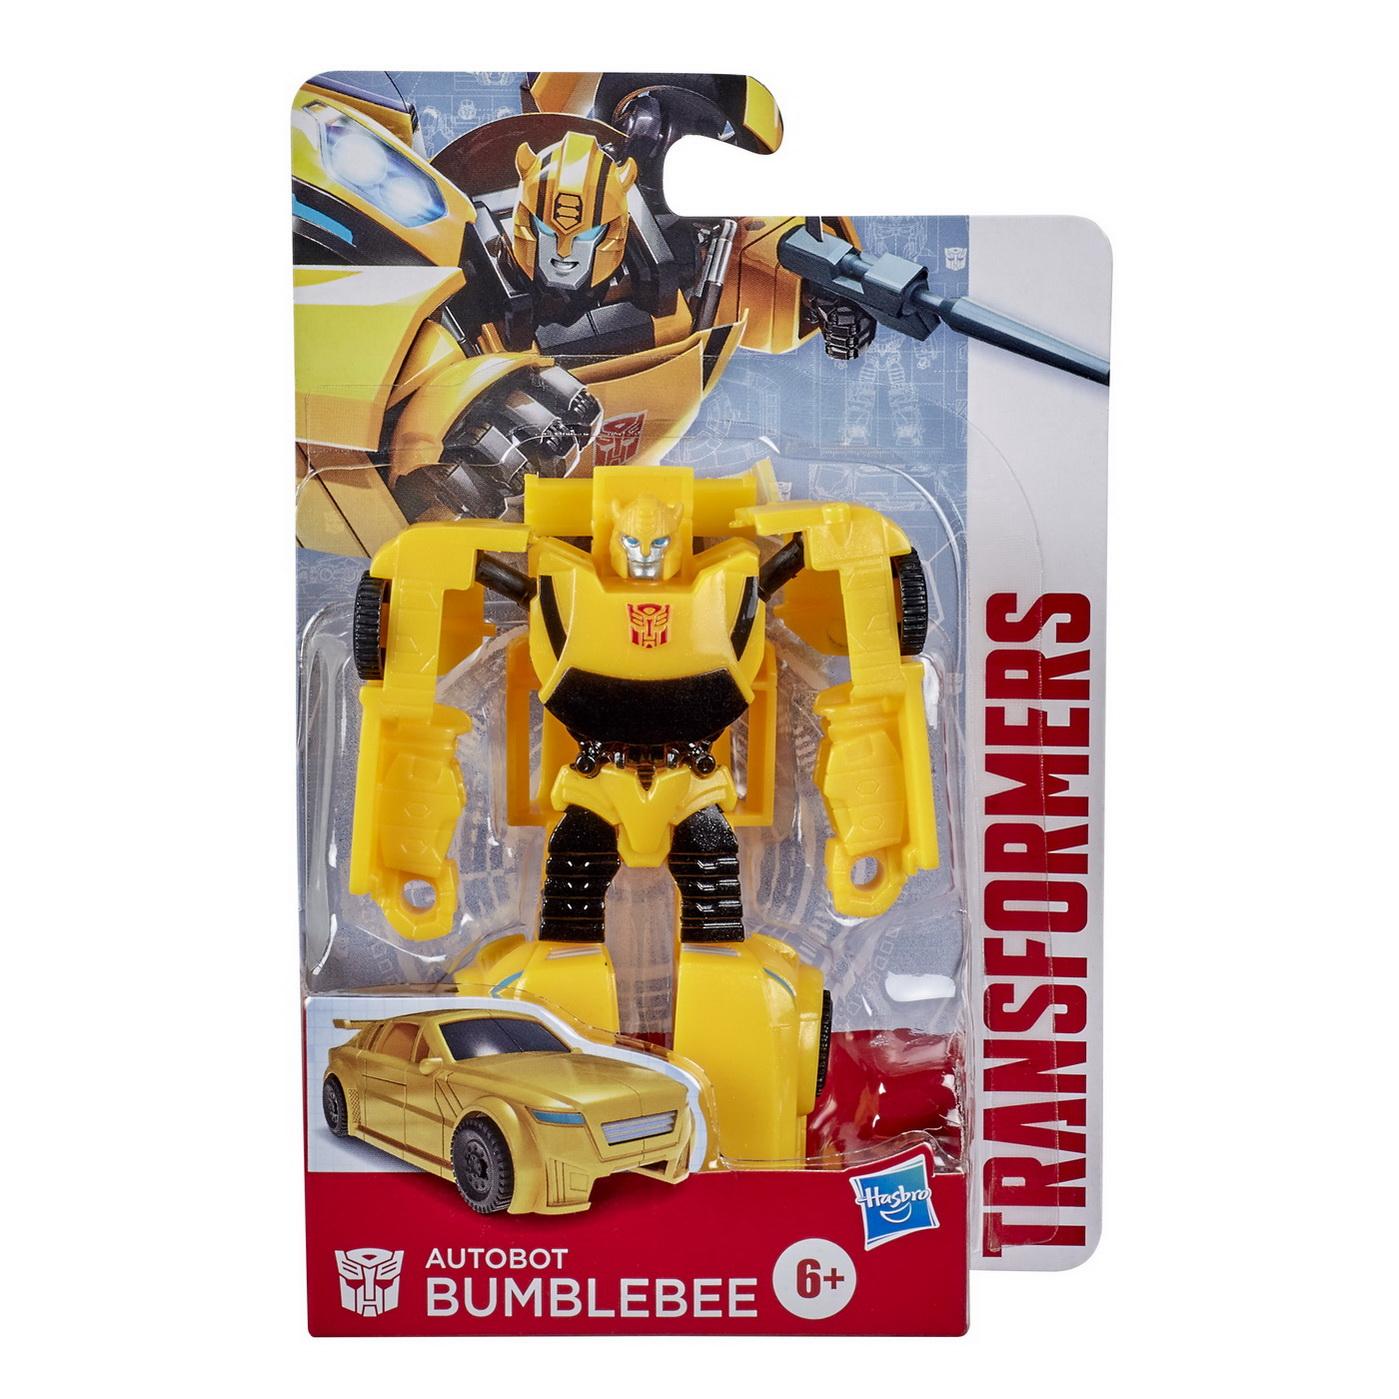 Jucarie - Transformers: Autobot Bumblebee | Hasbro